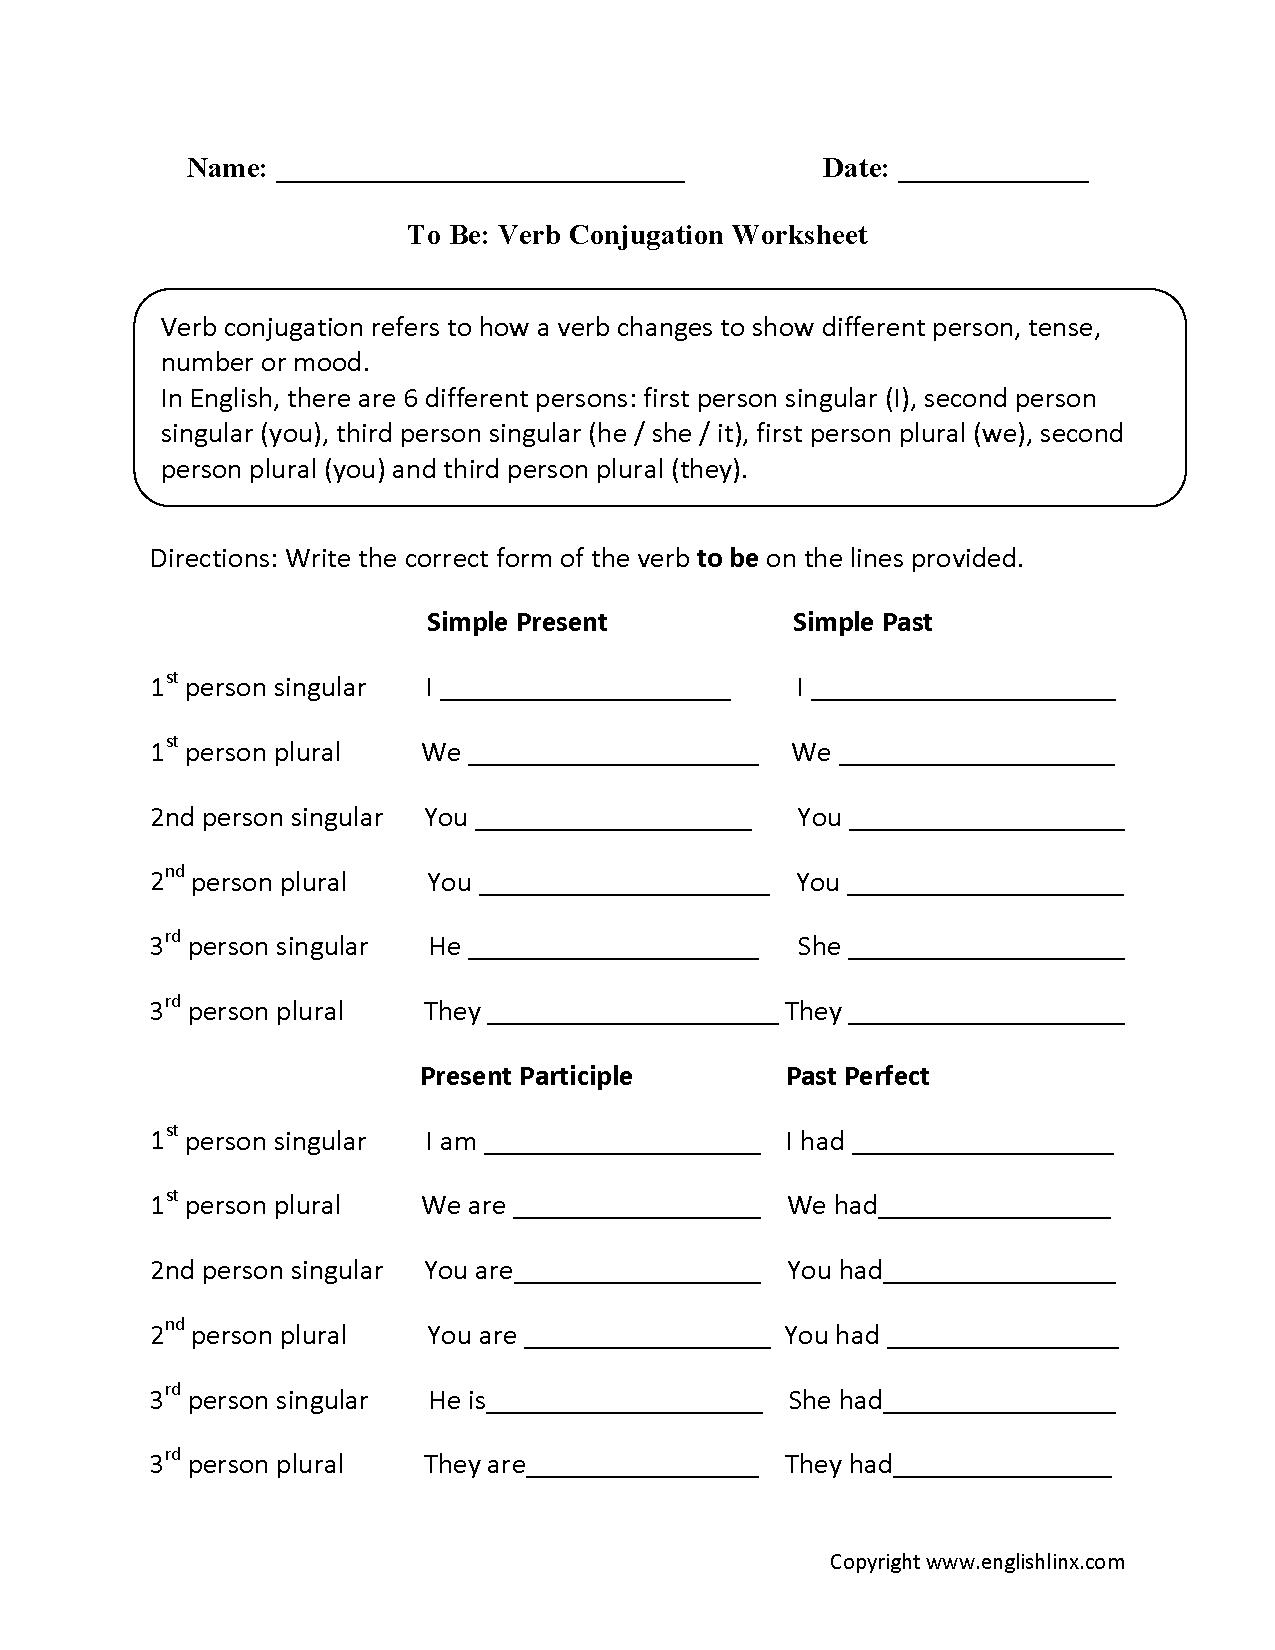 Verb Conjugation Worksheets | English | Pinterest